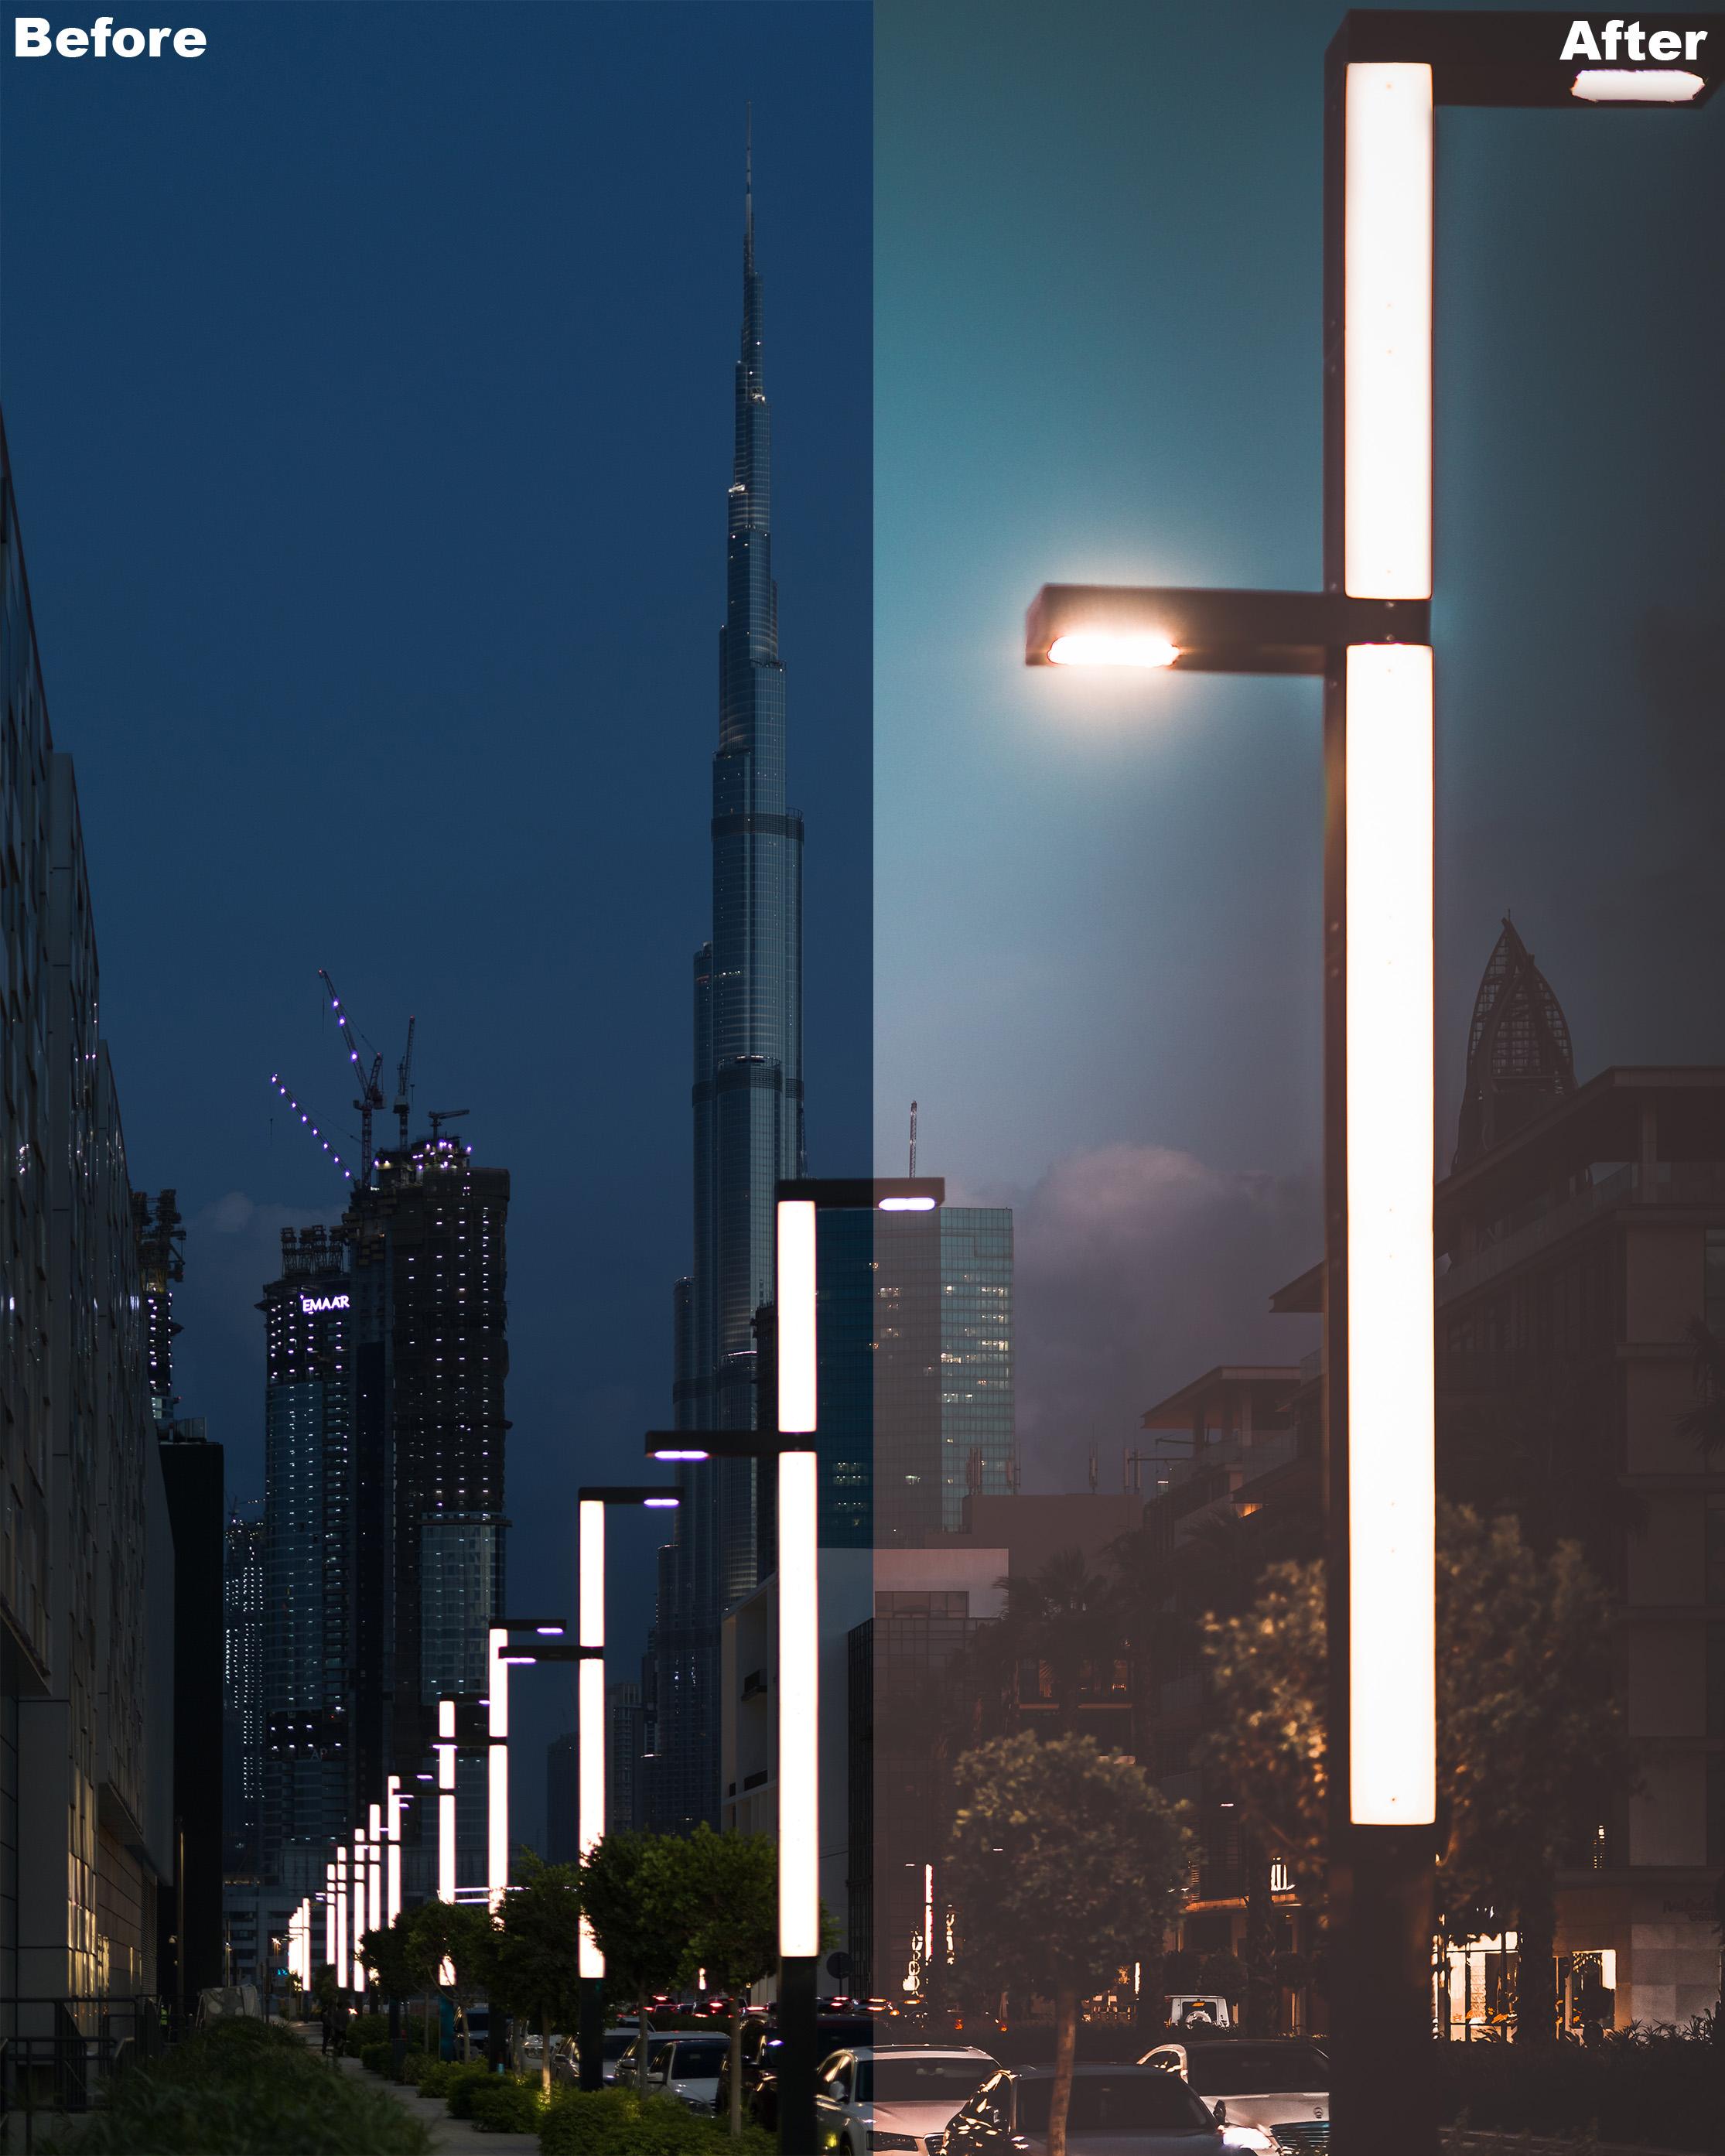 NT Urban 2 (for evening shots).jpg